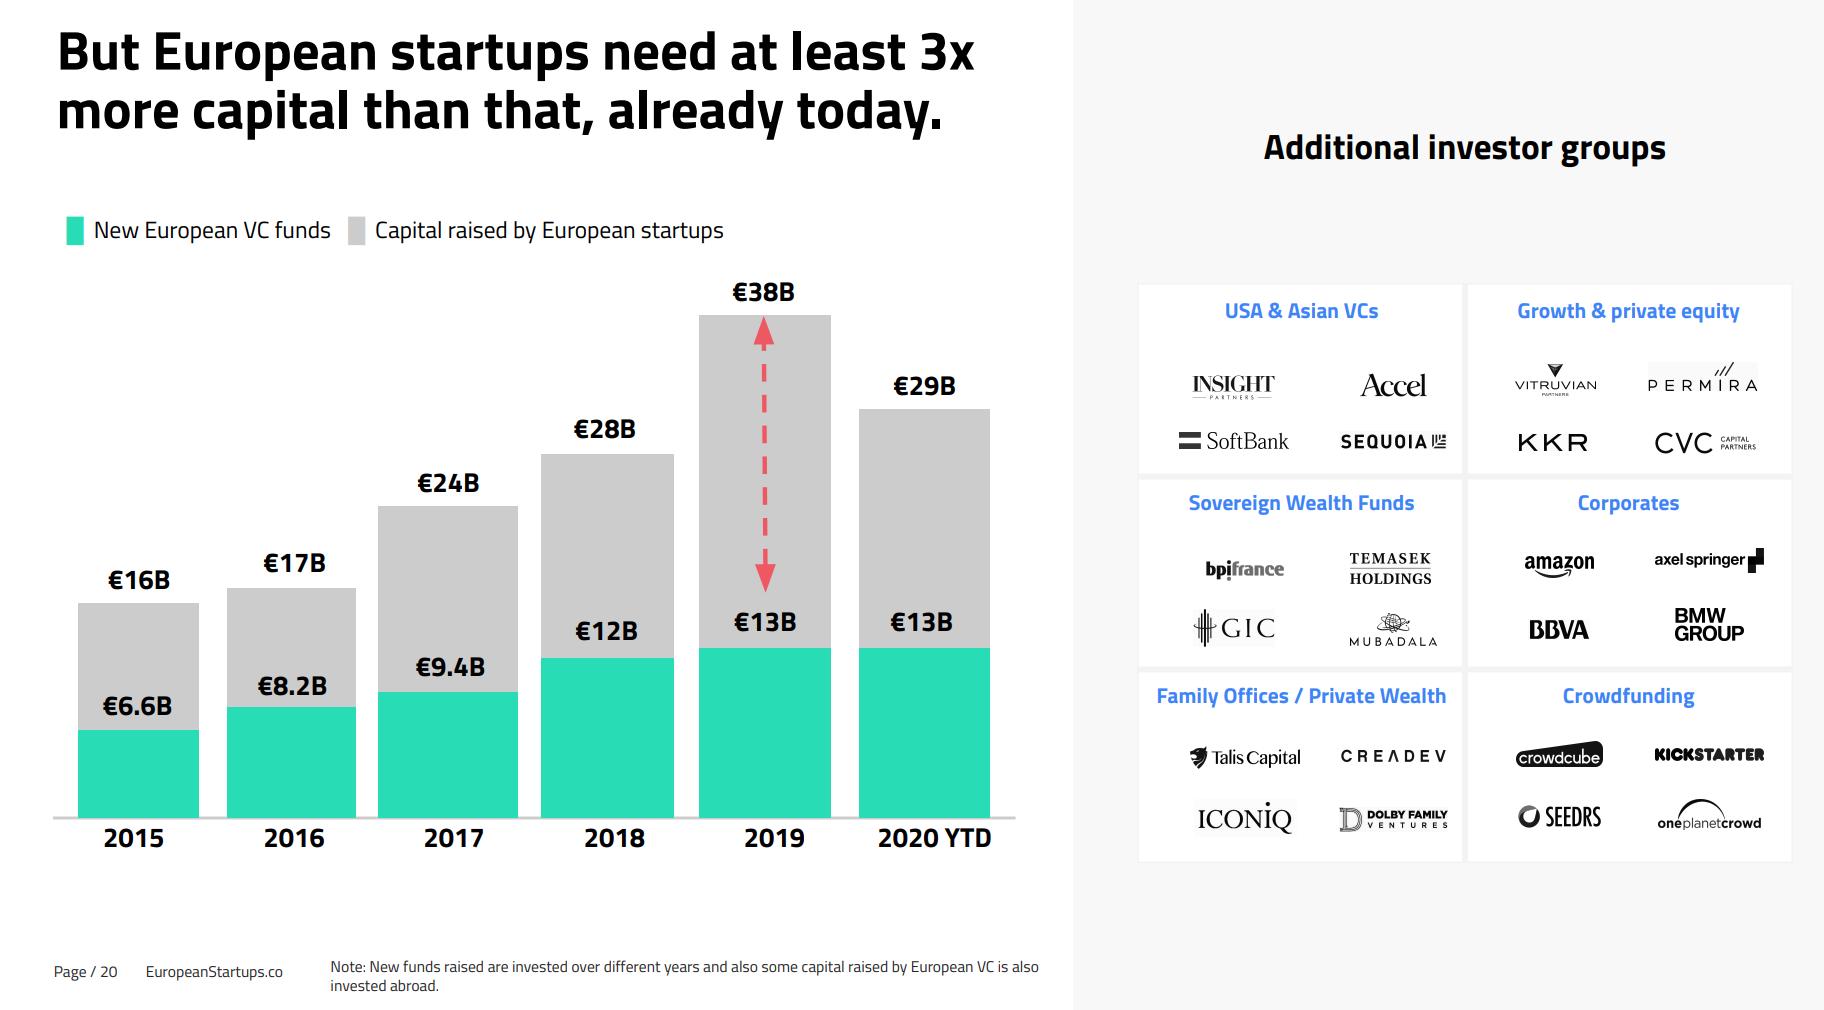 European startups need 3x more capital